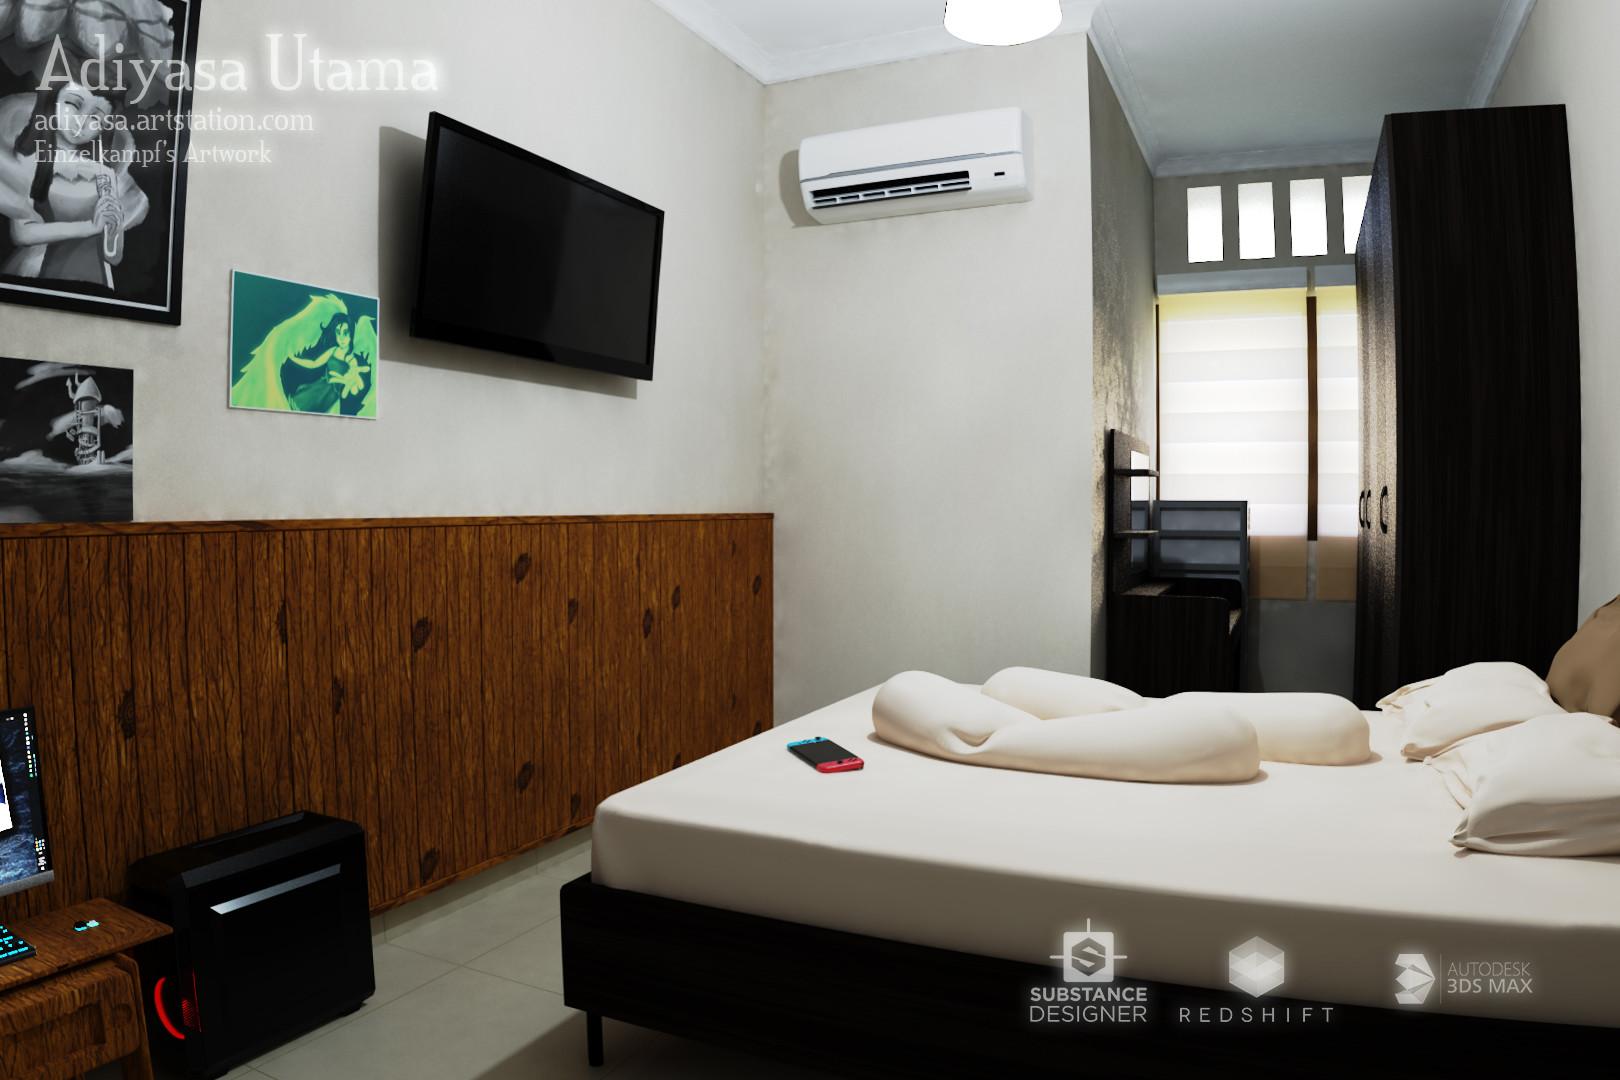 ArtStation - Bedroom, Adiyasa Utama